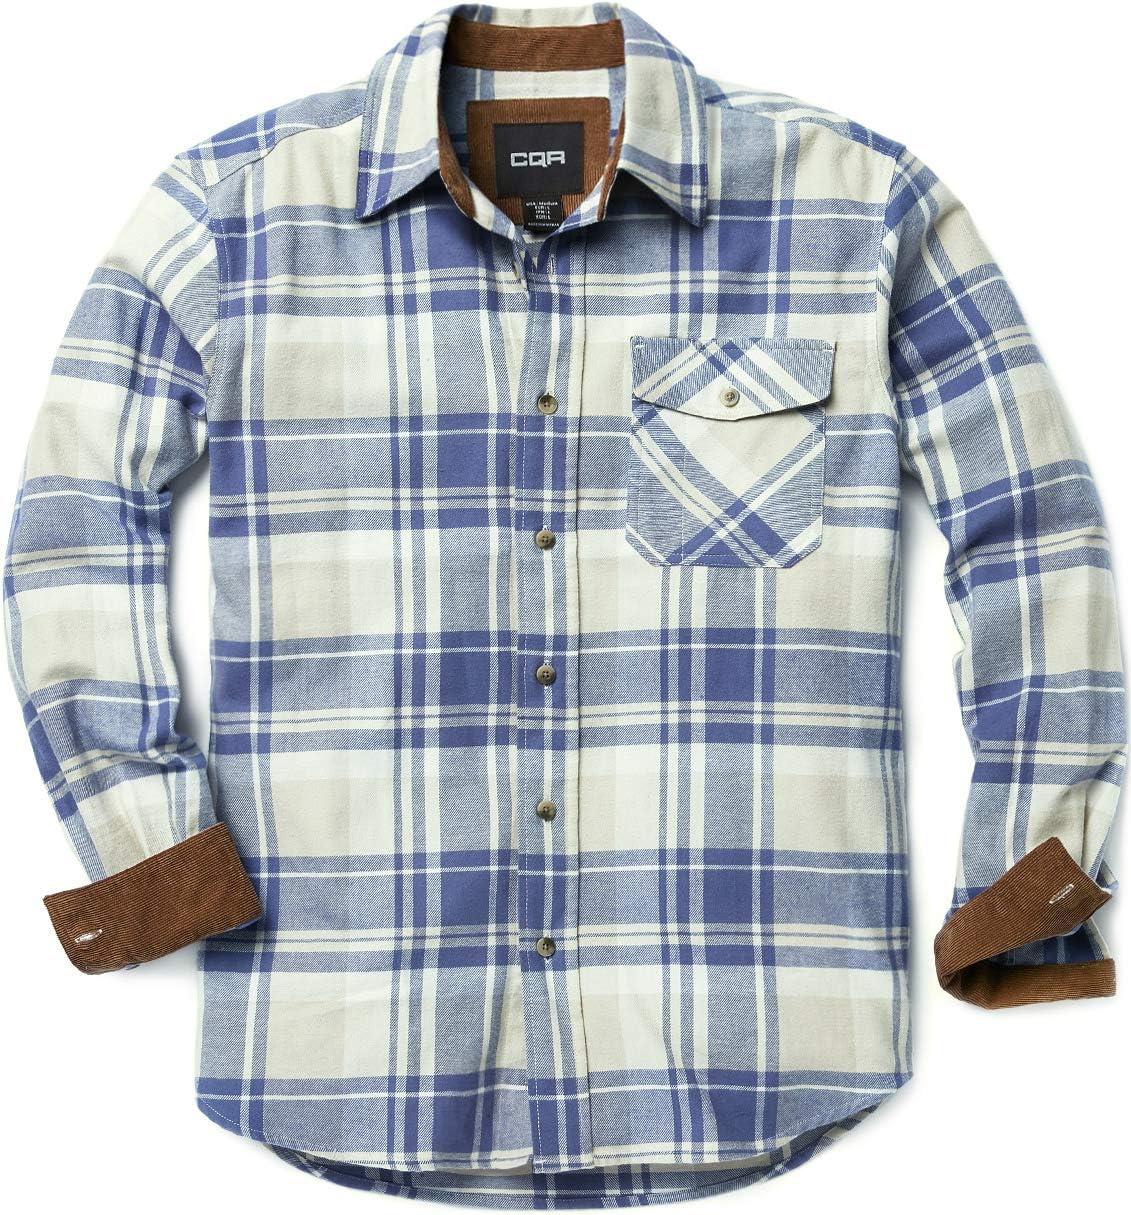 CQR HOF110 - Camisa de franela para hombre (manga larga, con botones, 100% algodón), Unisex adulto Niños Hombre Infantil, CQ-HOF110-CBL, xxx-large: Amazon.es: Deportes y aire libre